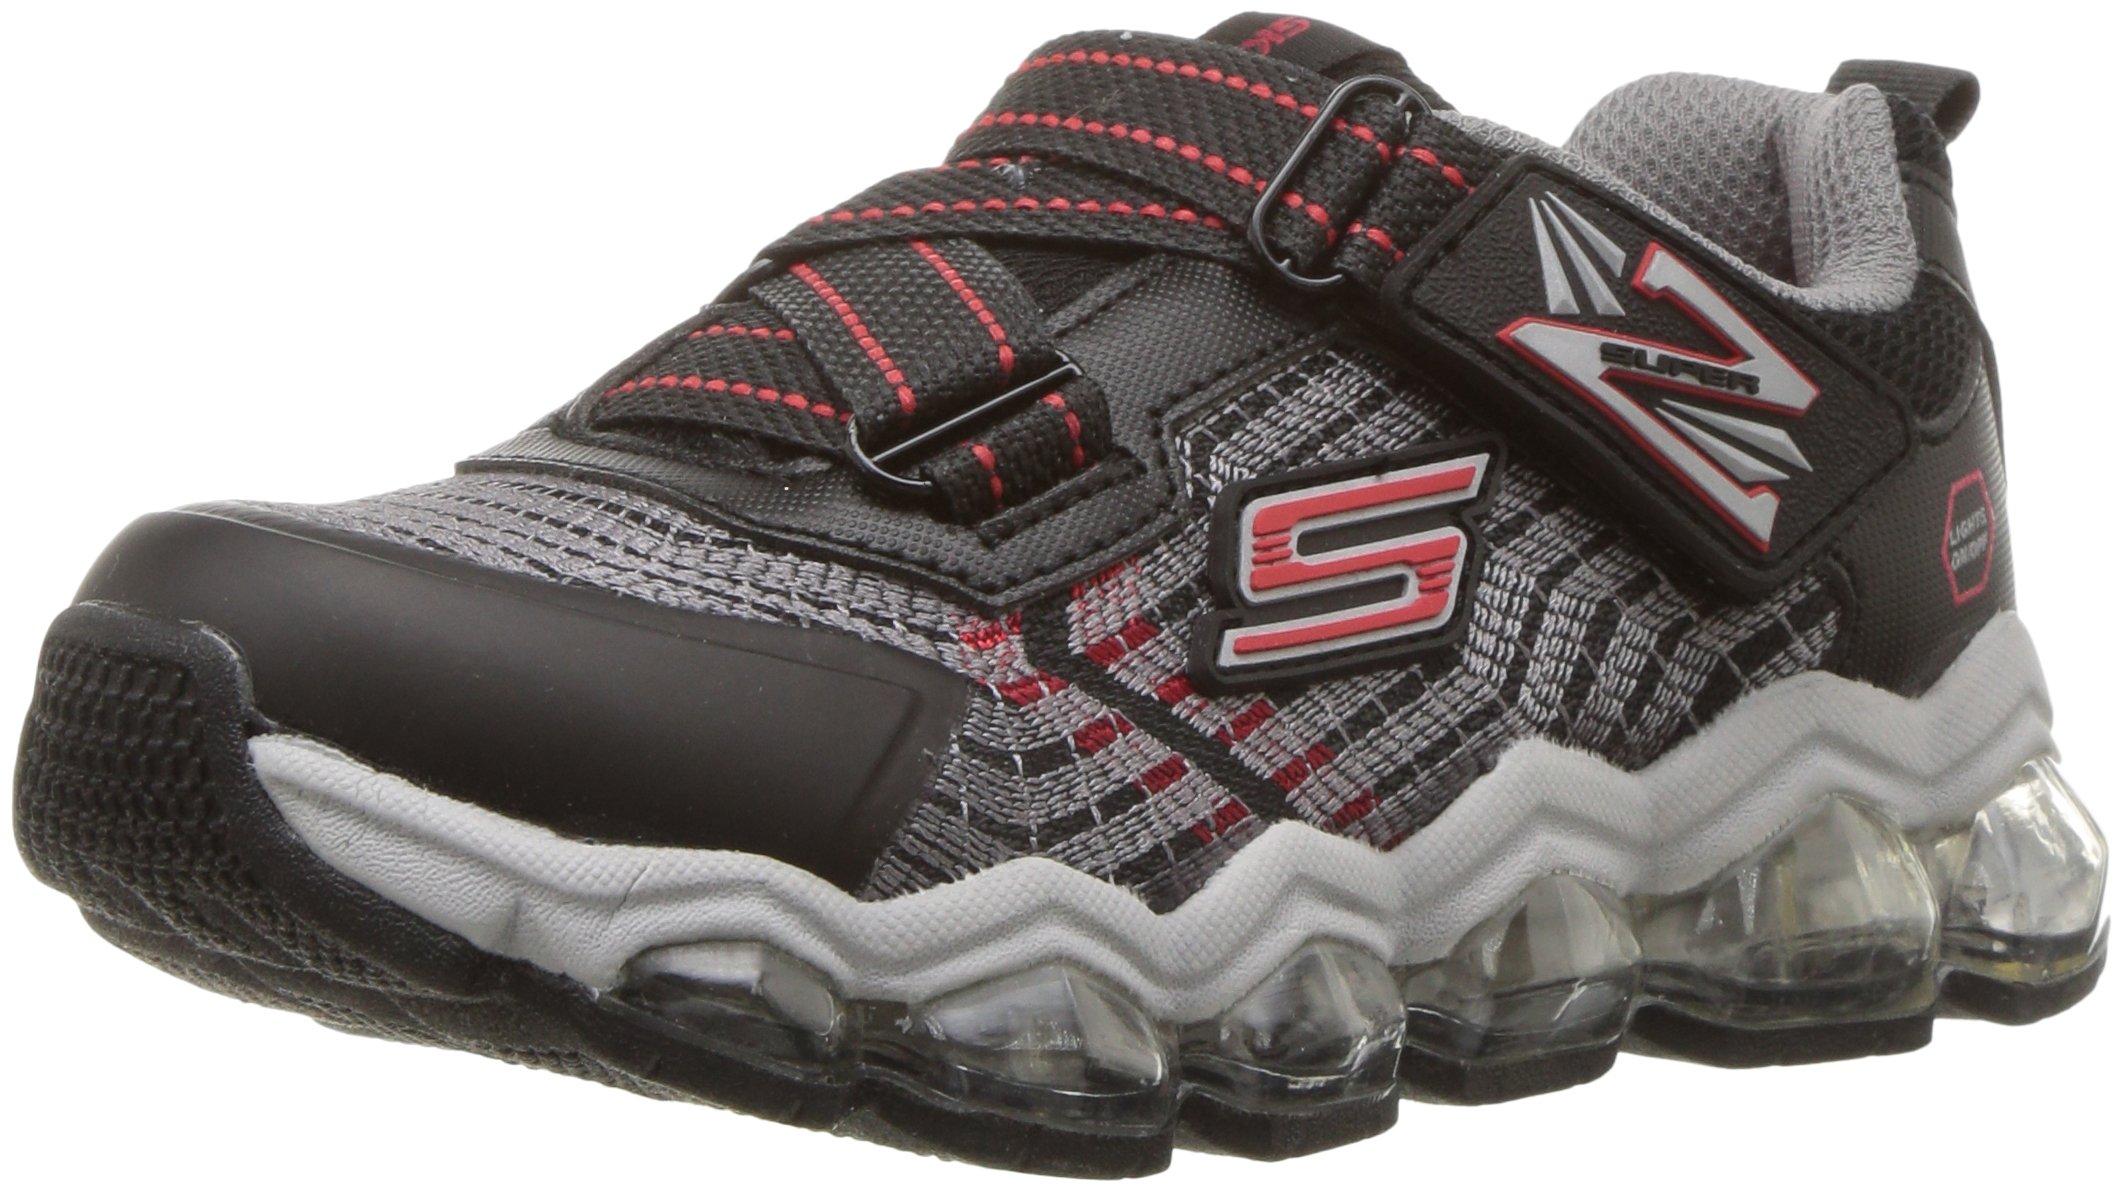 Skechers Kids Boys' Turbo-Flash-90596L Sneaker,Black/red,3 Medium US Little Kid